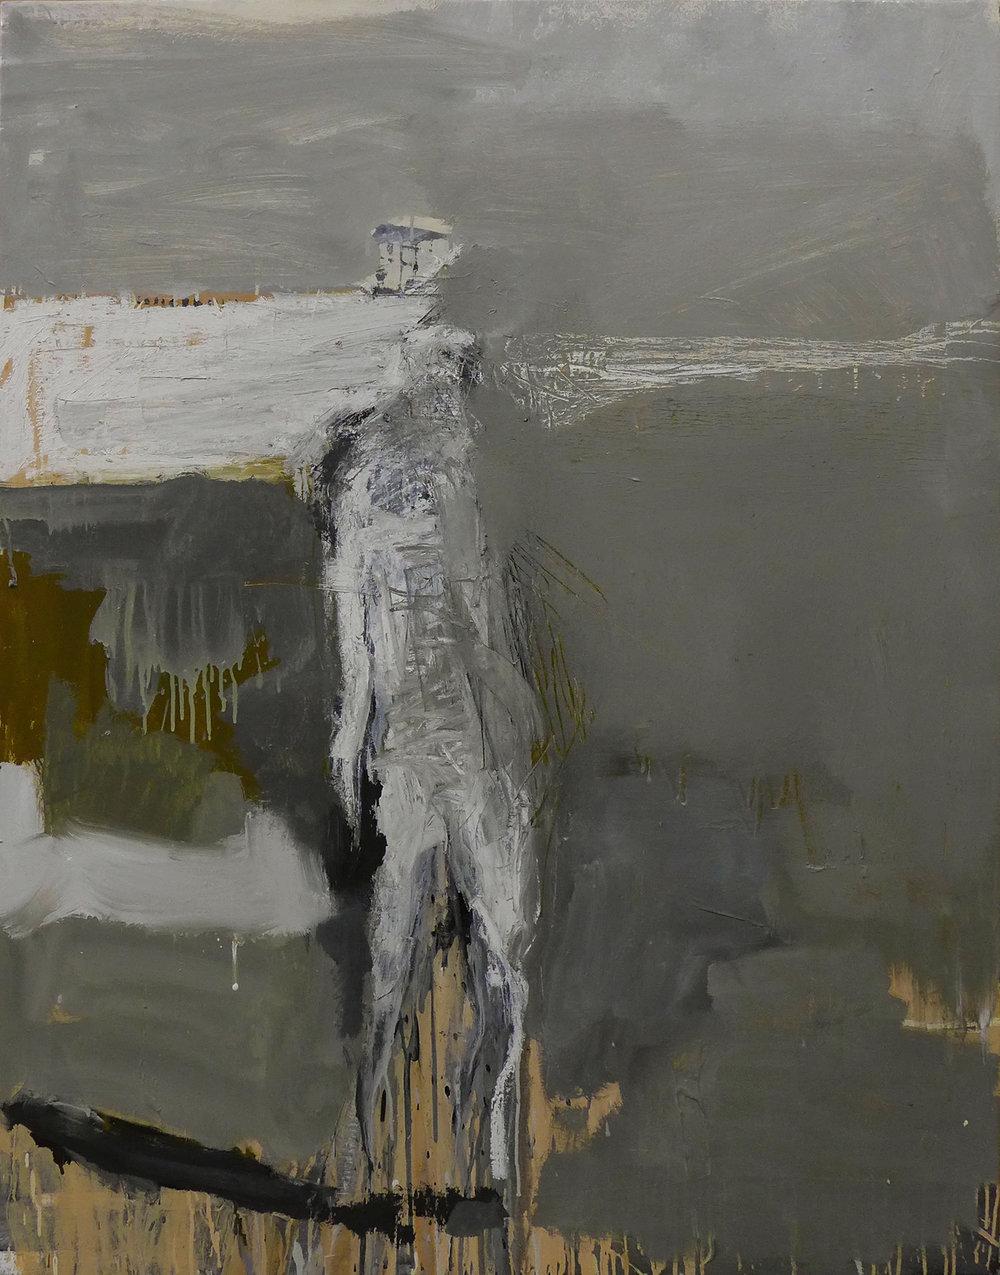 Hombre sin título,  2016   Oil on canvas  130 x 100 cm